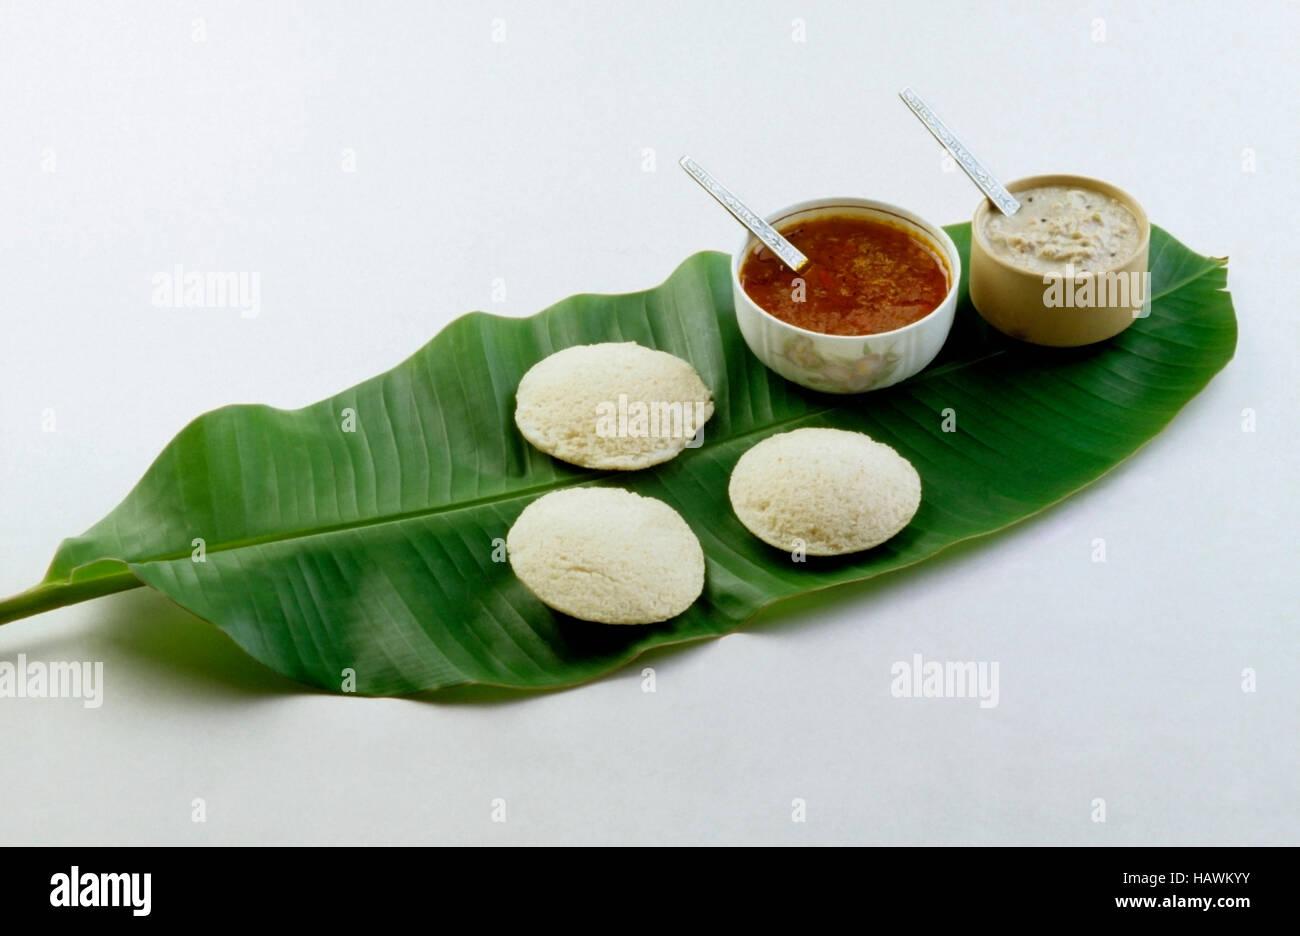 Idli Sambar, chutney on banana leaf.  South Indian snack, India Stock Photo